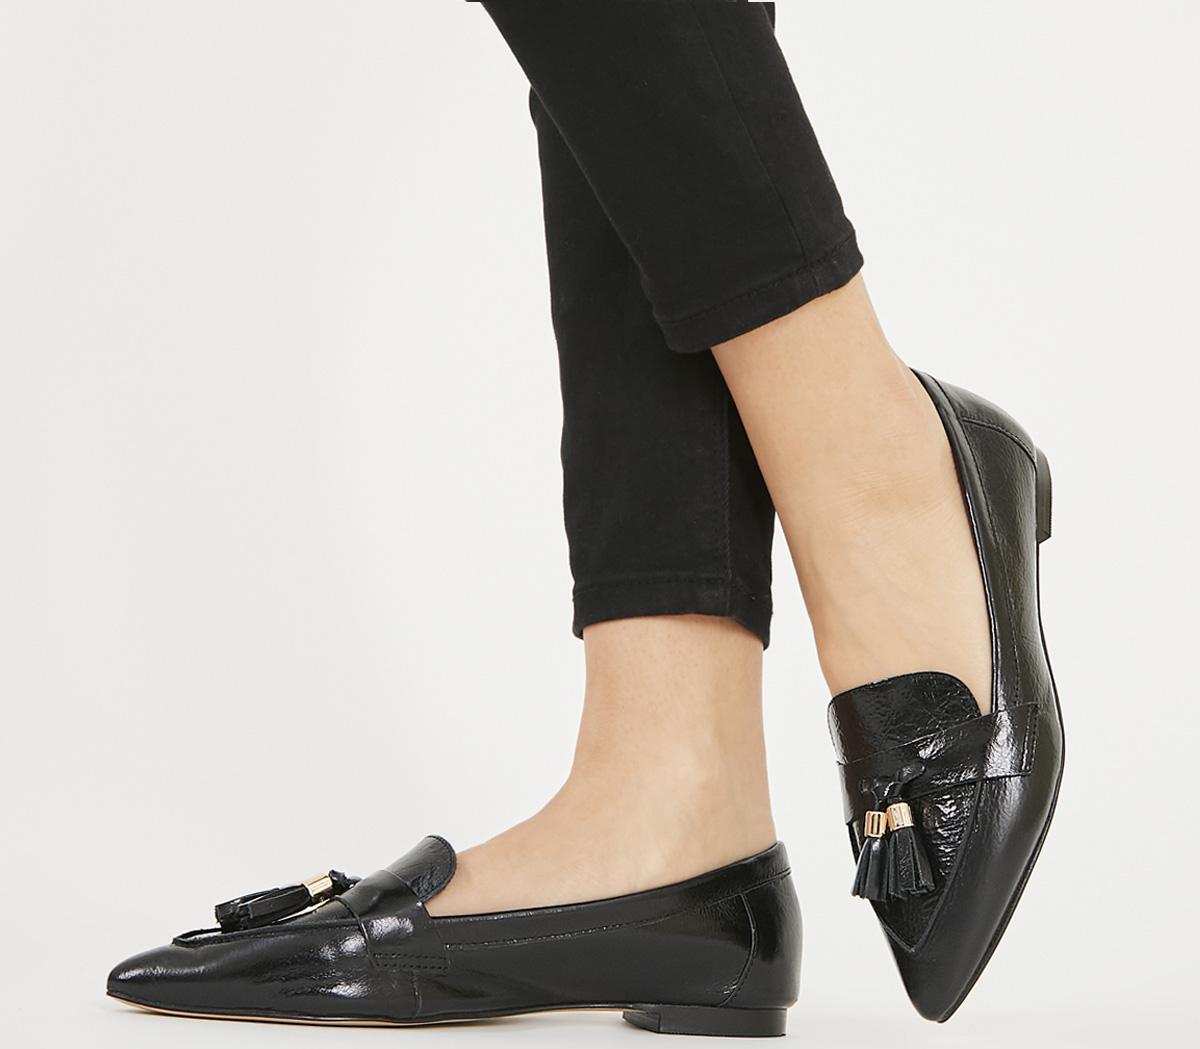 Office Fib- Pointed Tassel Loafer Black